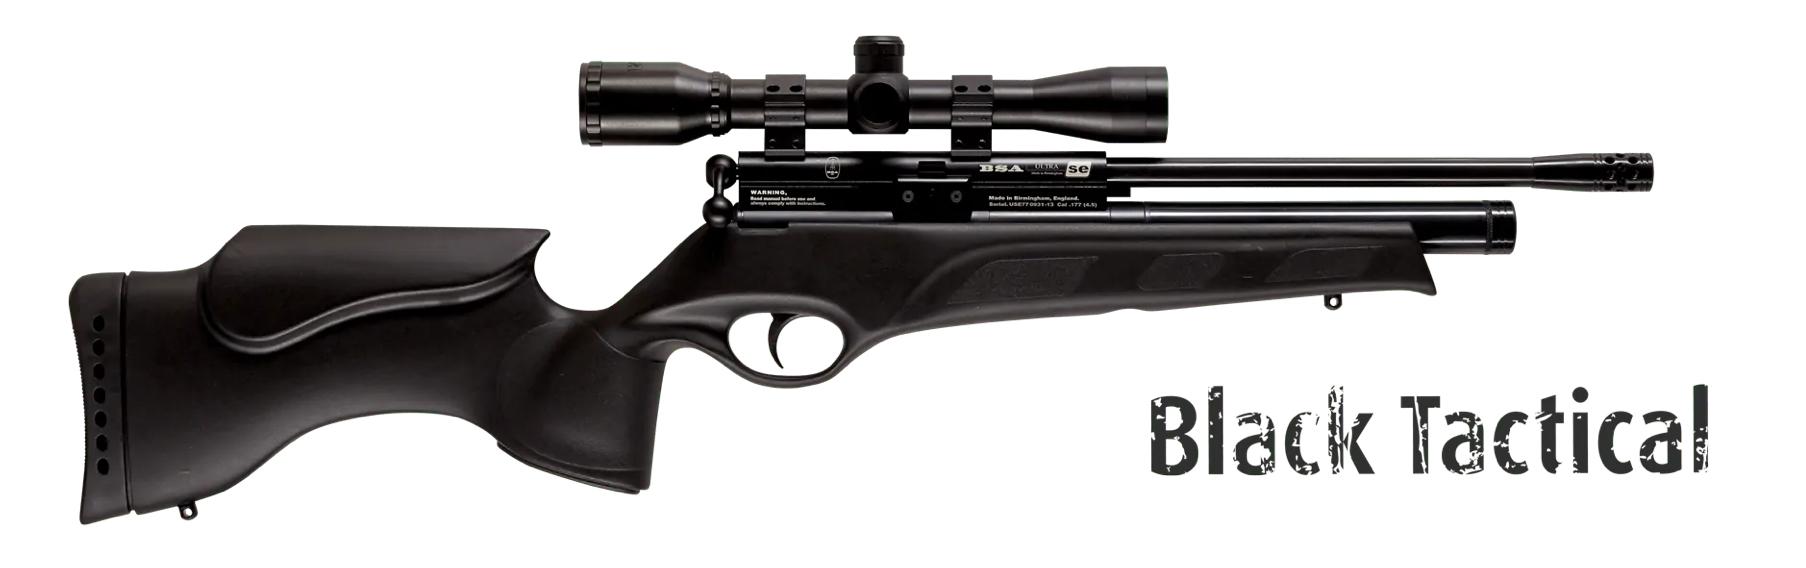 BSA Ultra SE Tactical